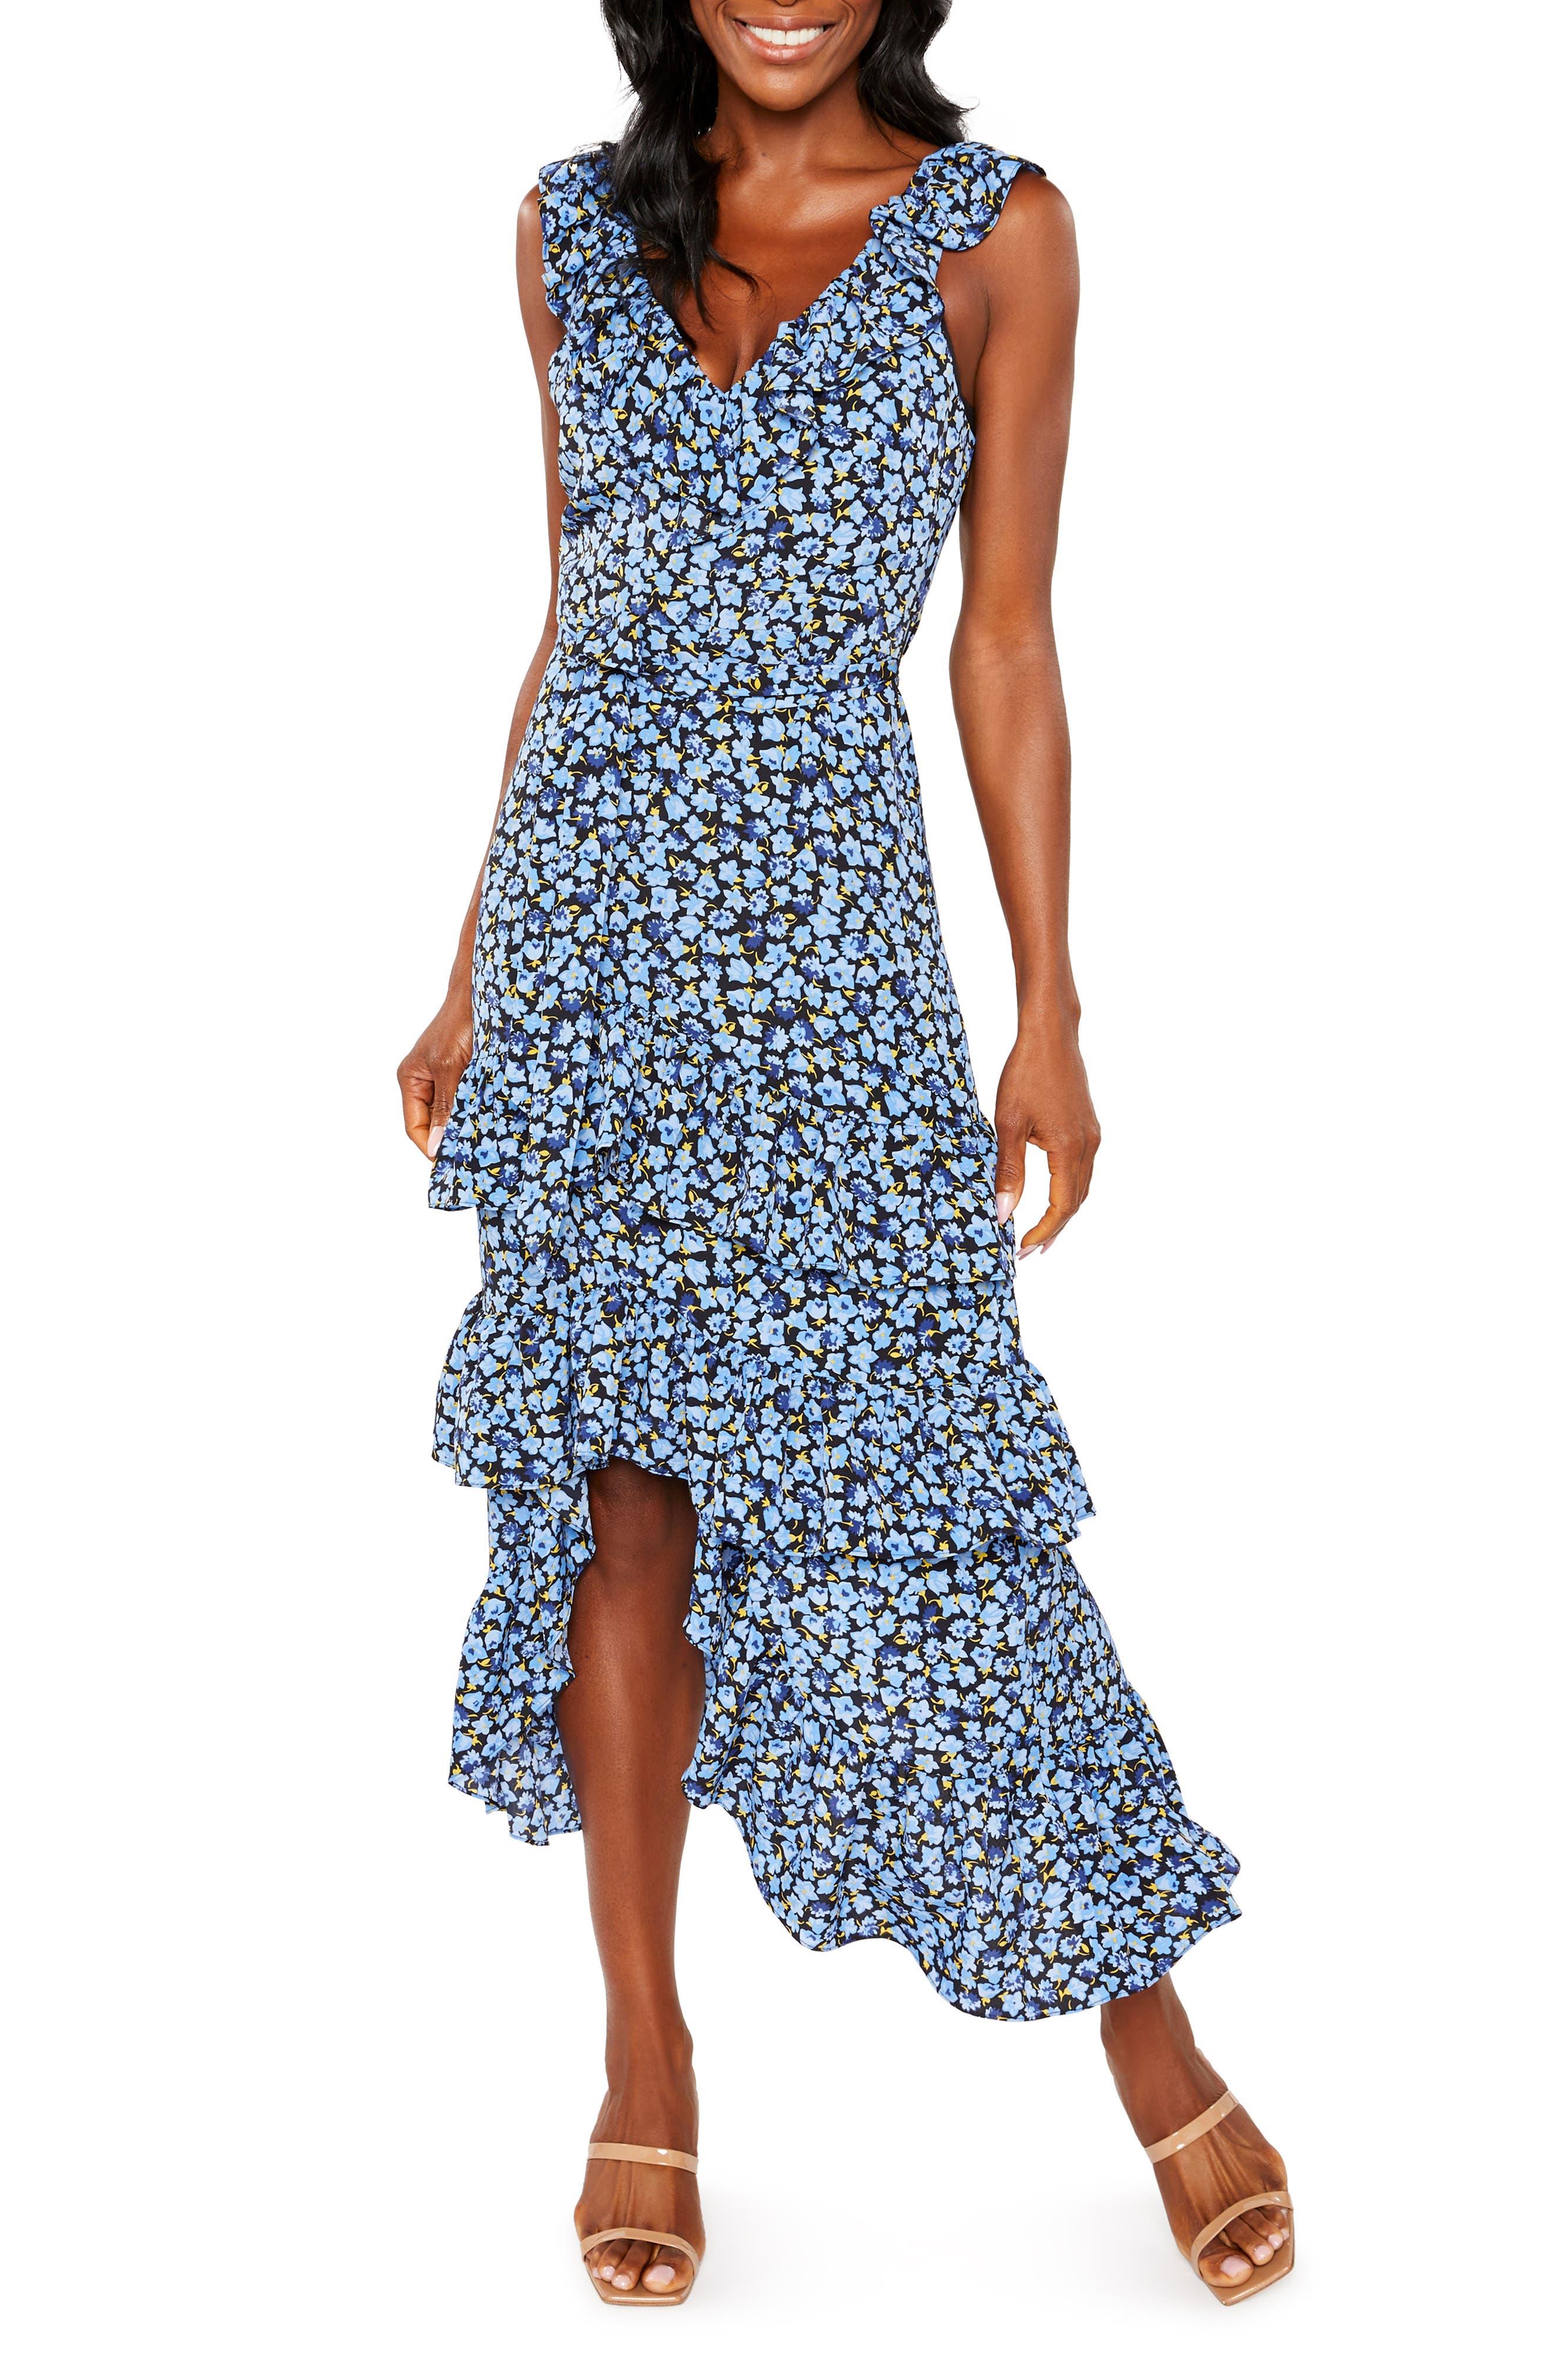 Morrell Floral Sleeveless Dress